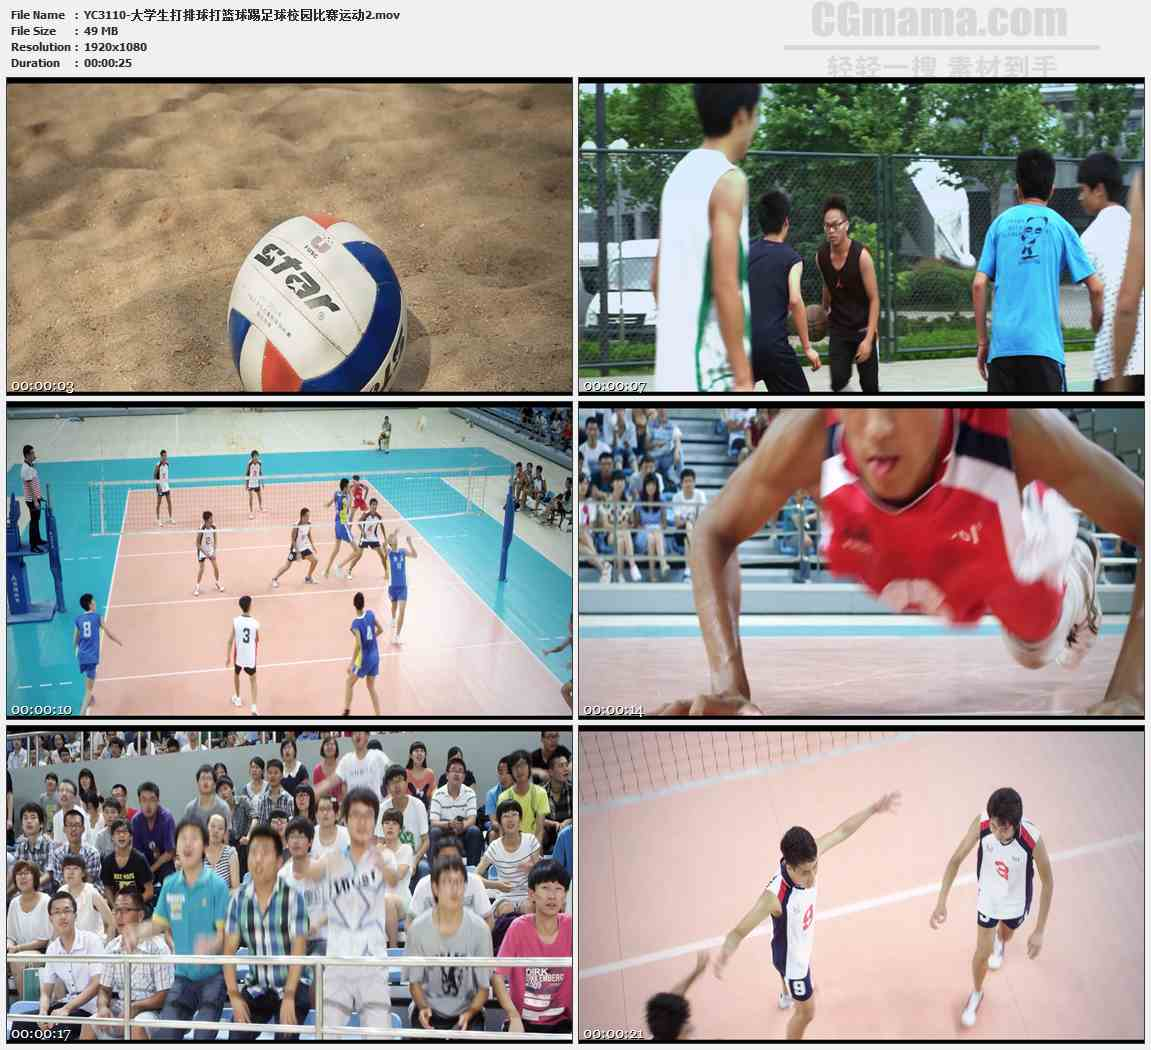 YC3110-大学生打排球打篮球踢足球校园比赛运动高清实拍视频素材